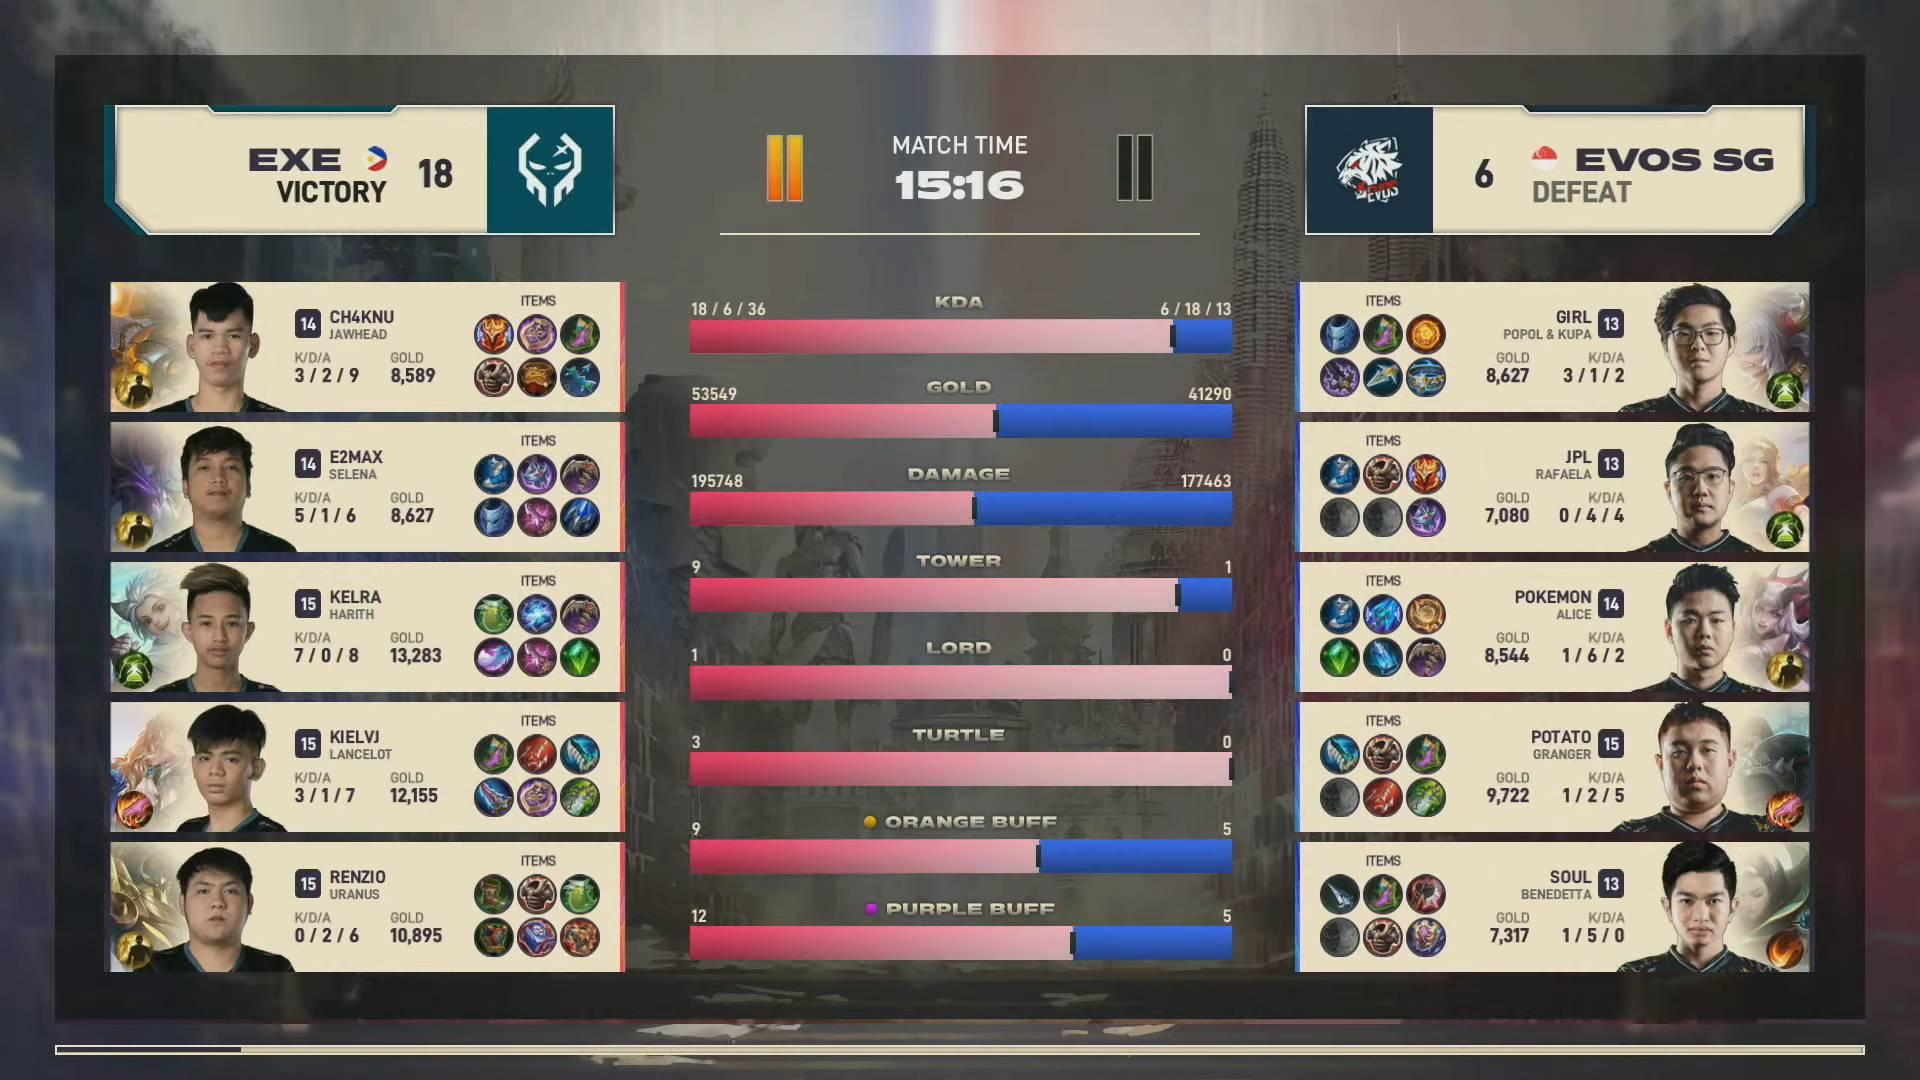 2021-MSC-Execration-def-Evos-SG-Game-2 Kelra's Harith dominates as Execration pounces EVOS SG to open MSC campaign ESports Mobile Legends MPL-PH News  - philippine sports news